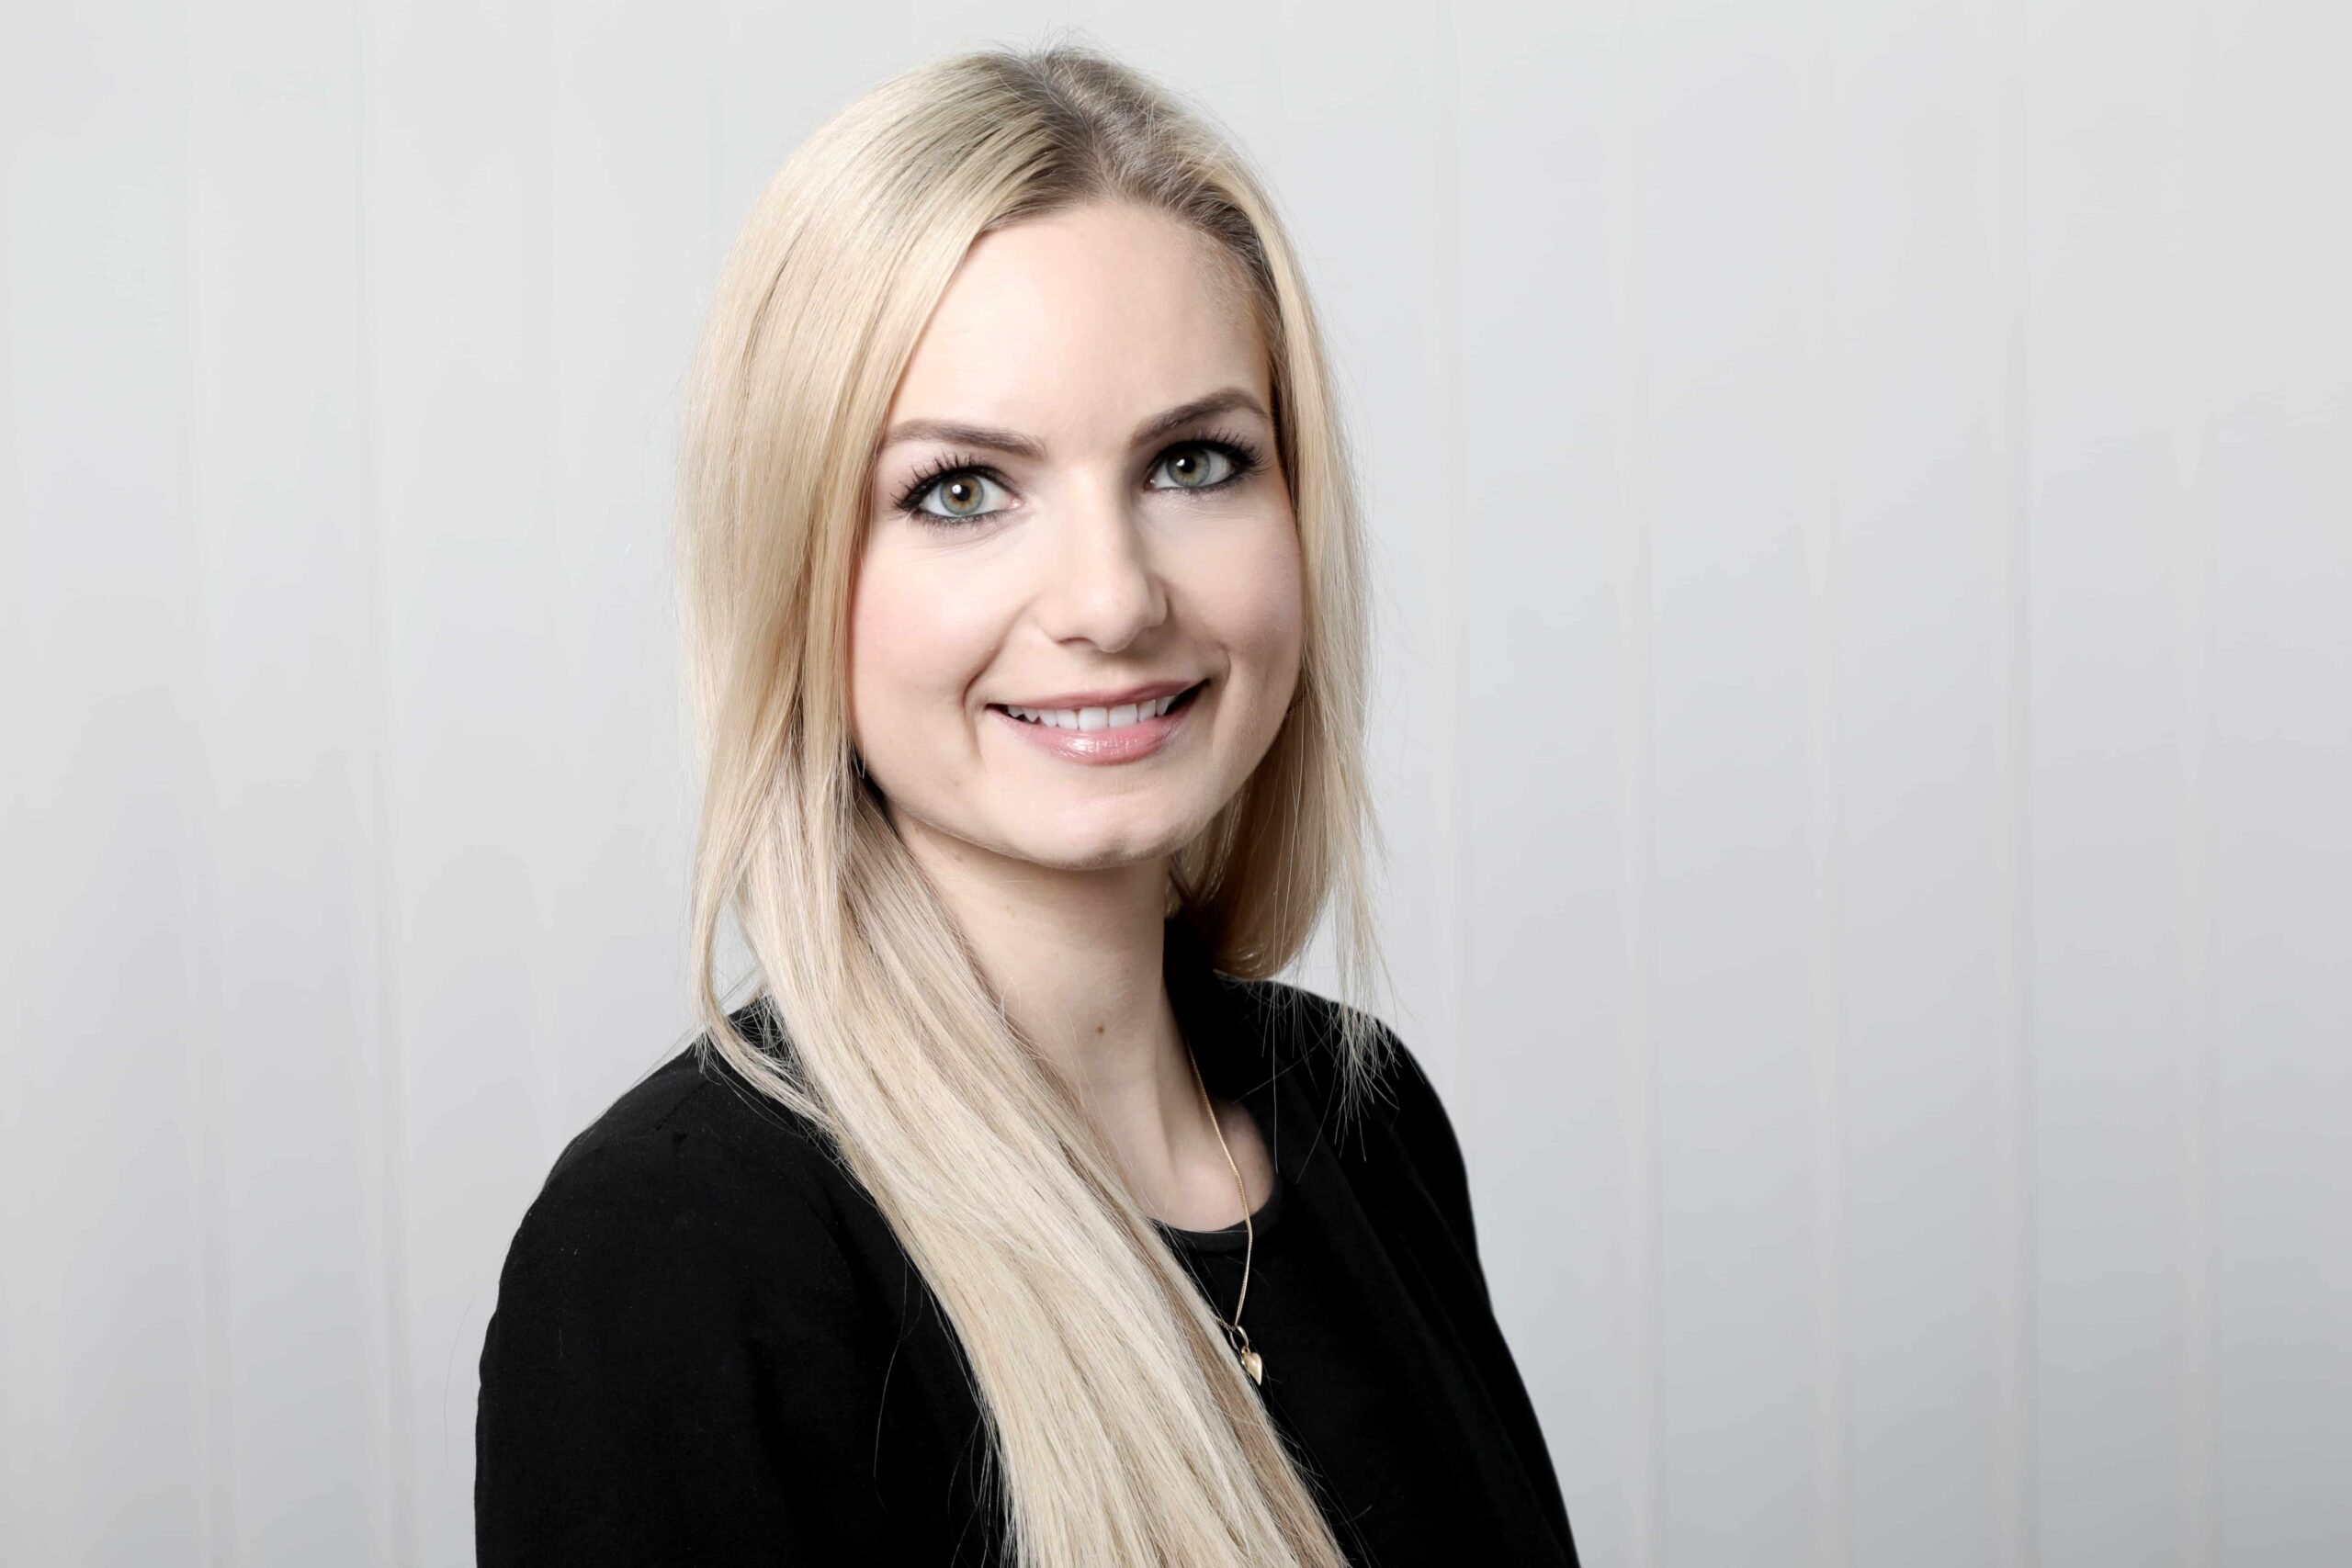 Jessica Zurschmiede